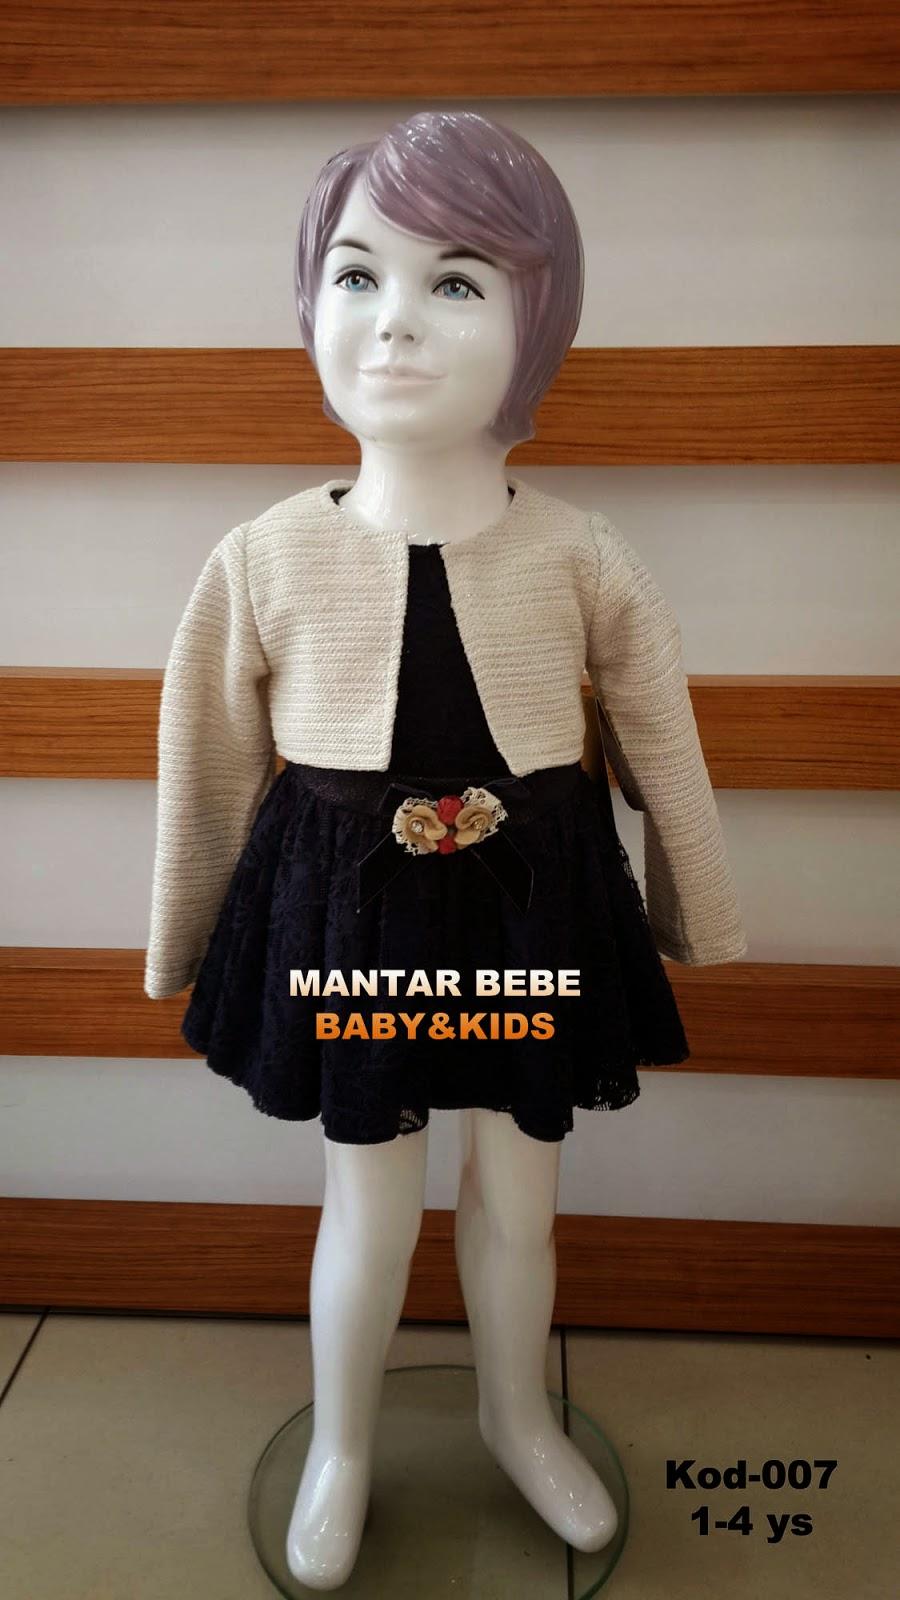 MANTAR BEBE ÇOCUK GİYİM - KOD007